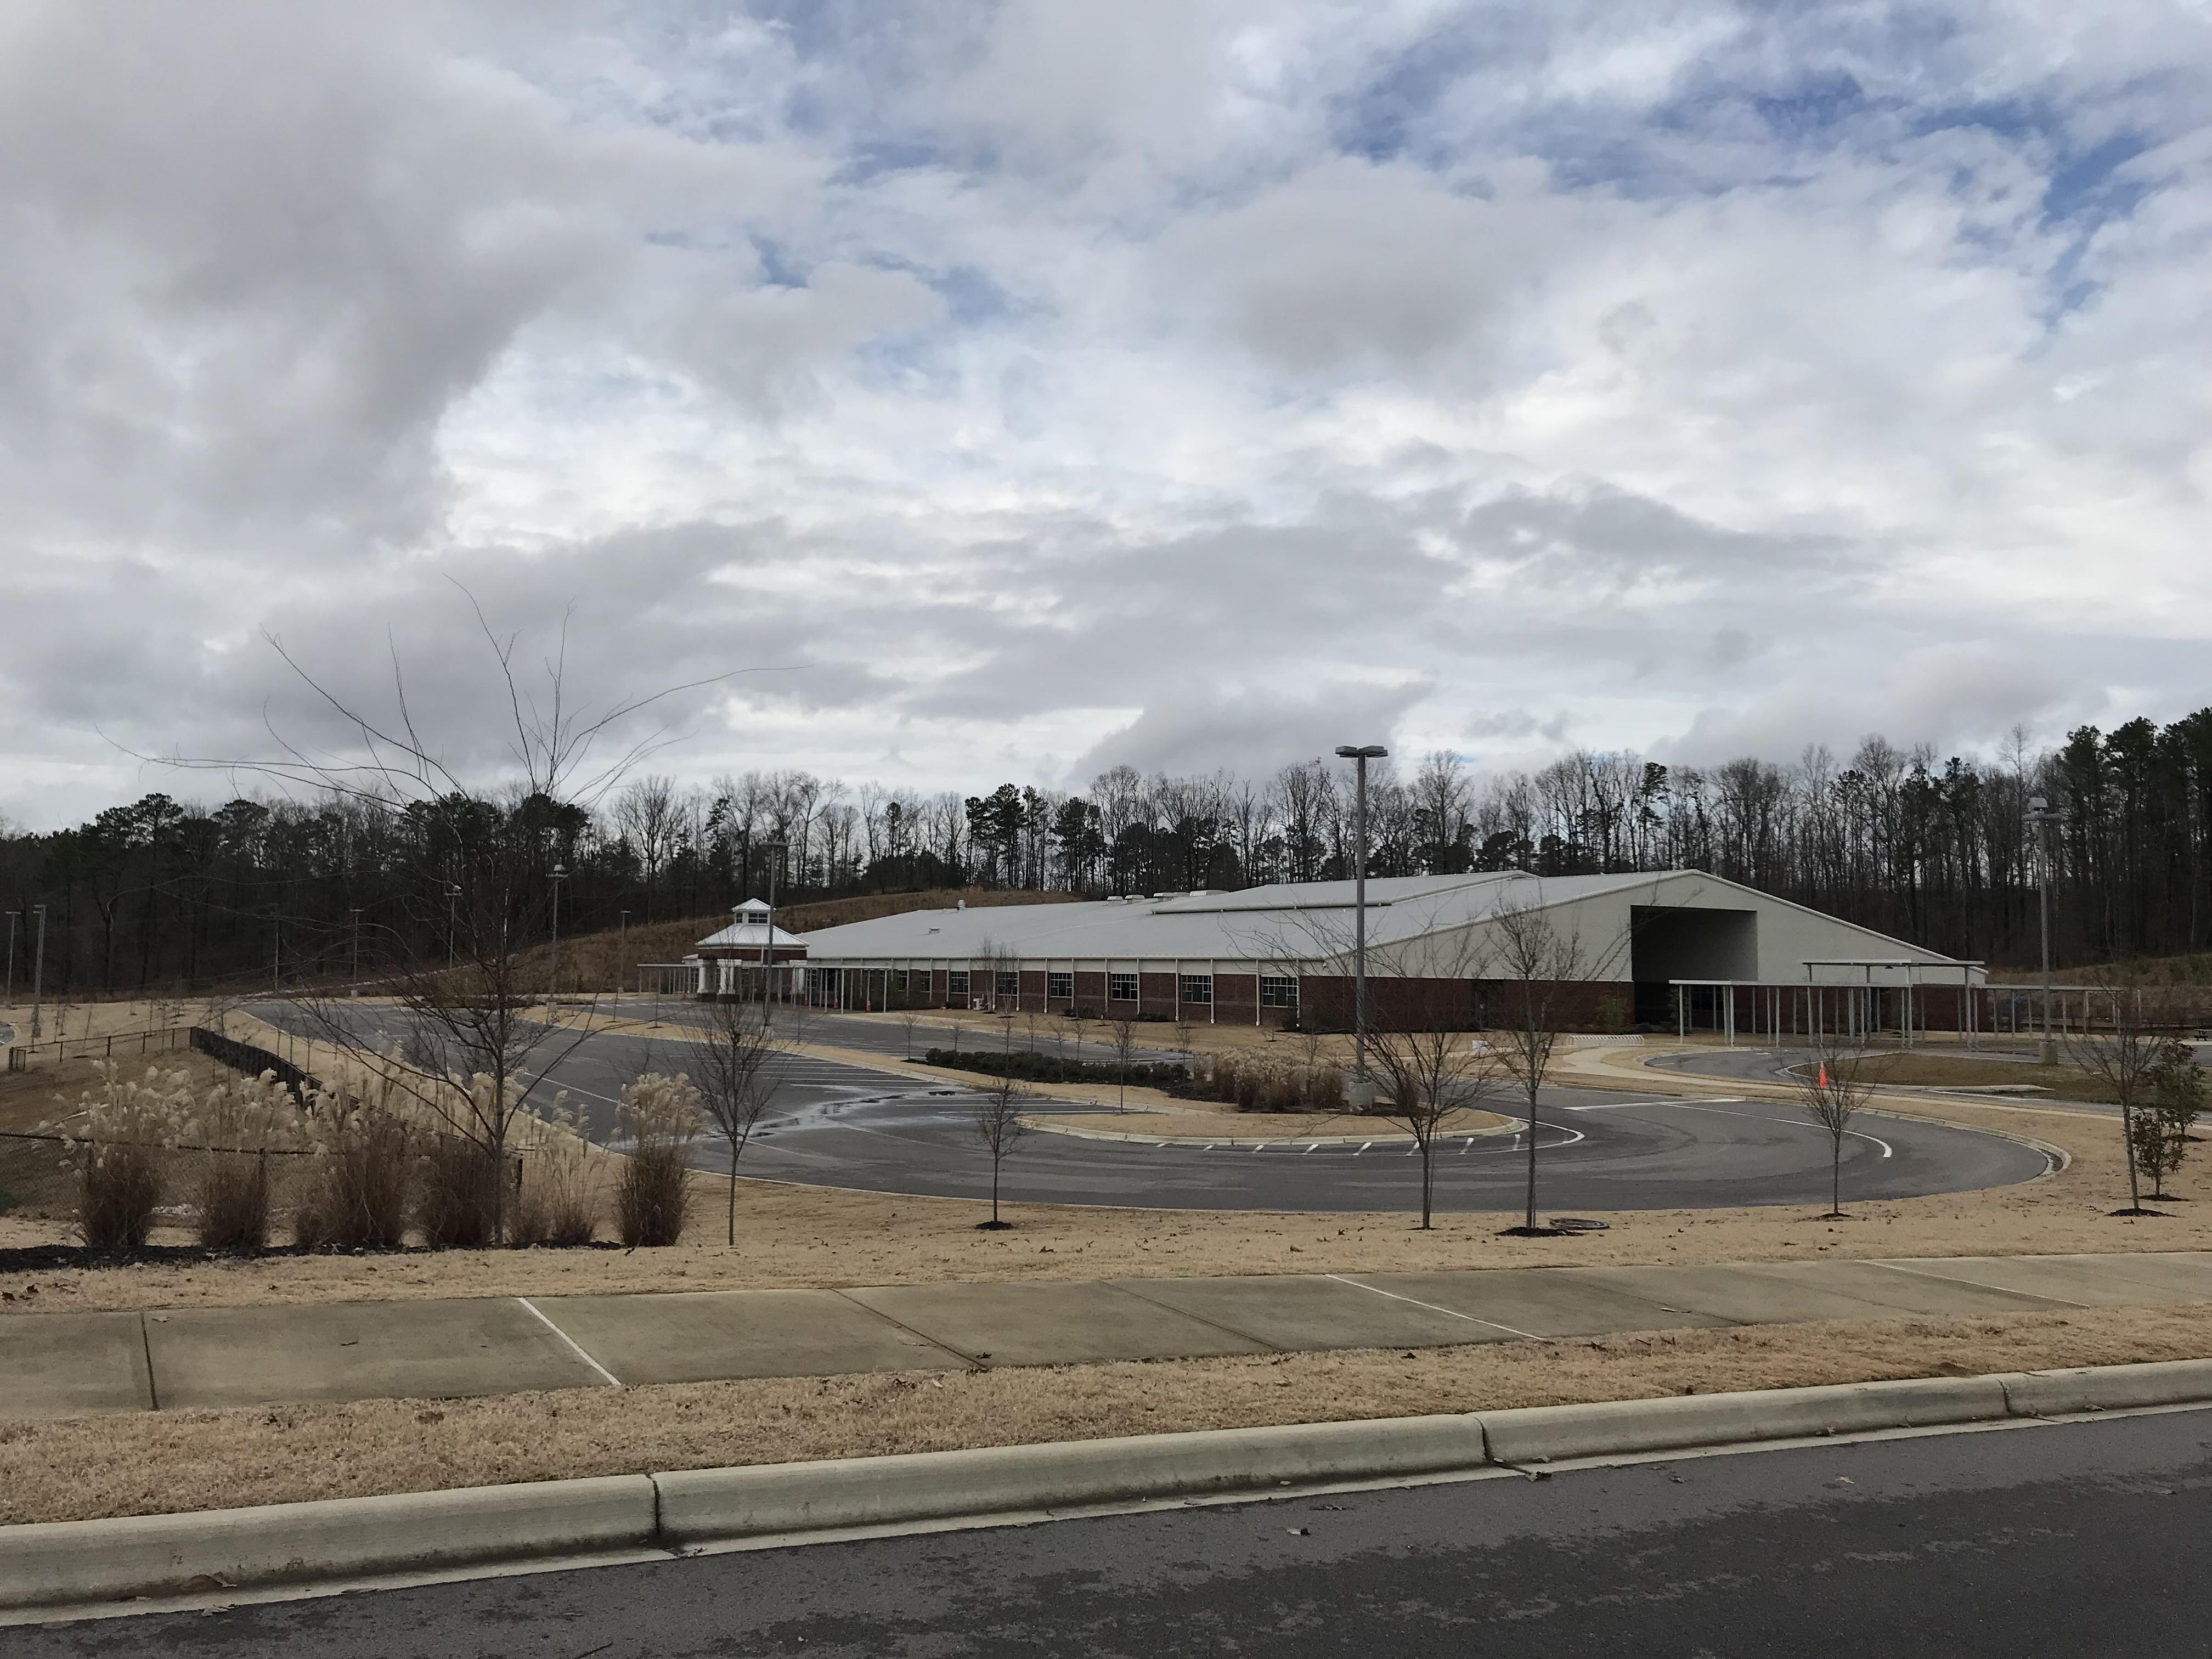 Magnolia Elementary across from Glen Cross